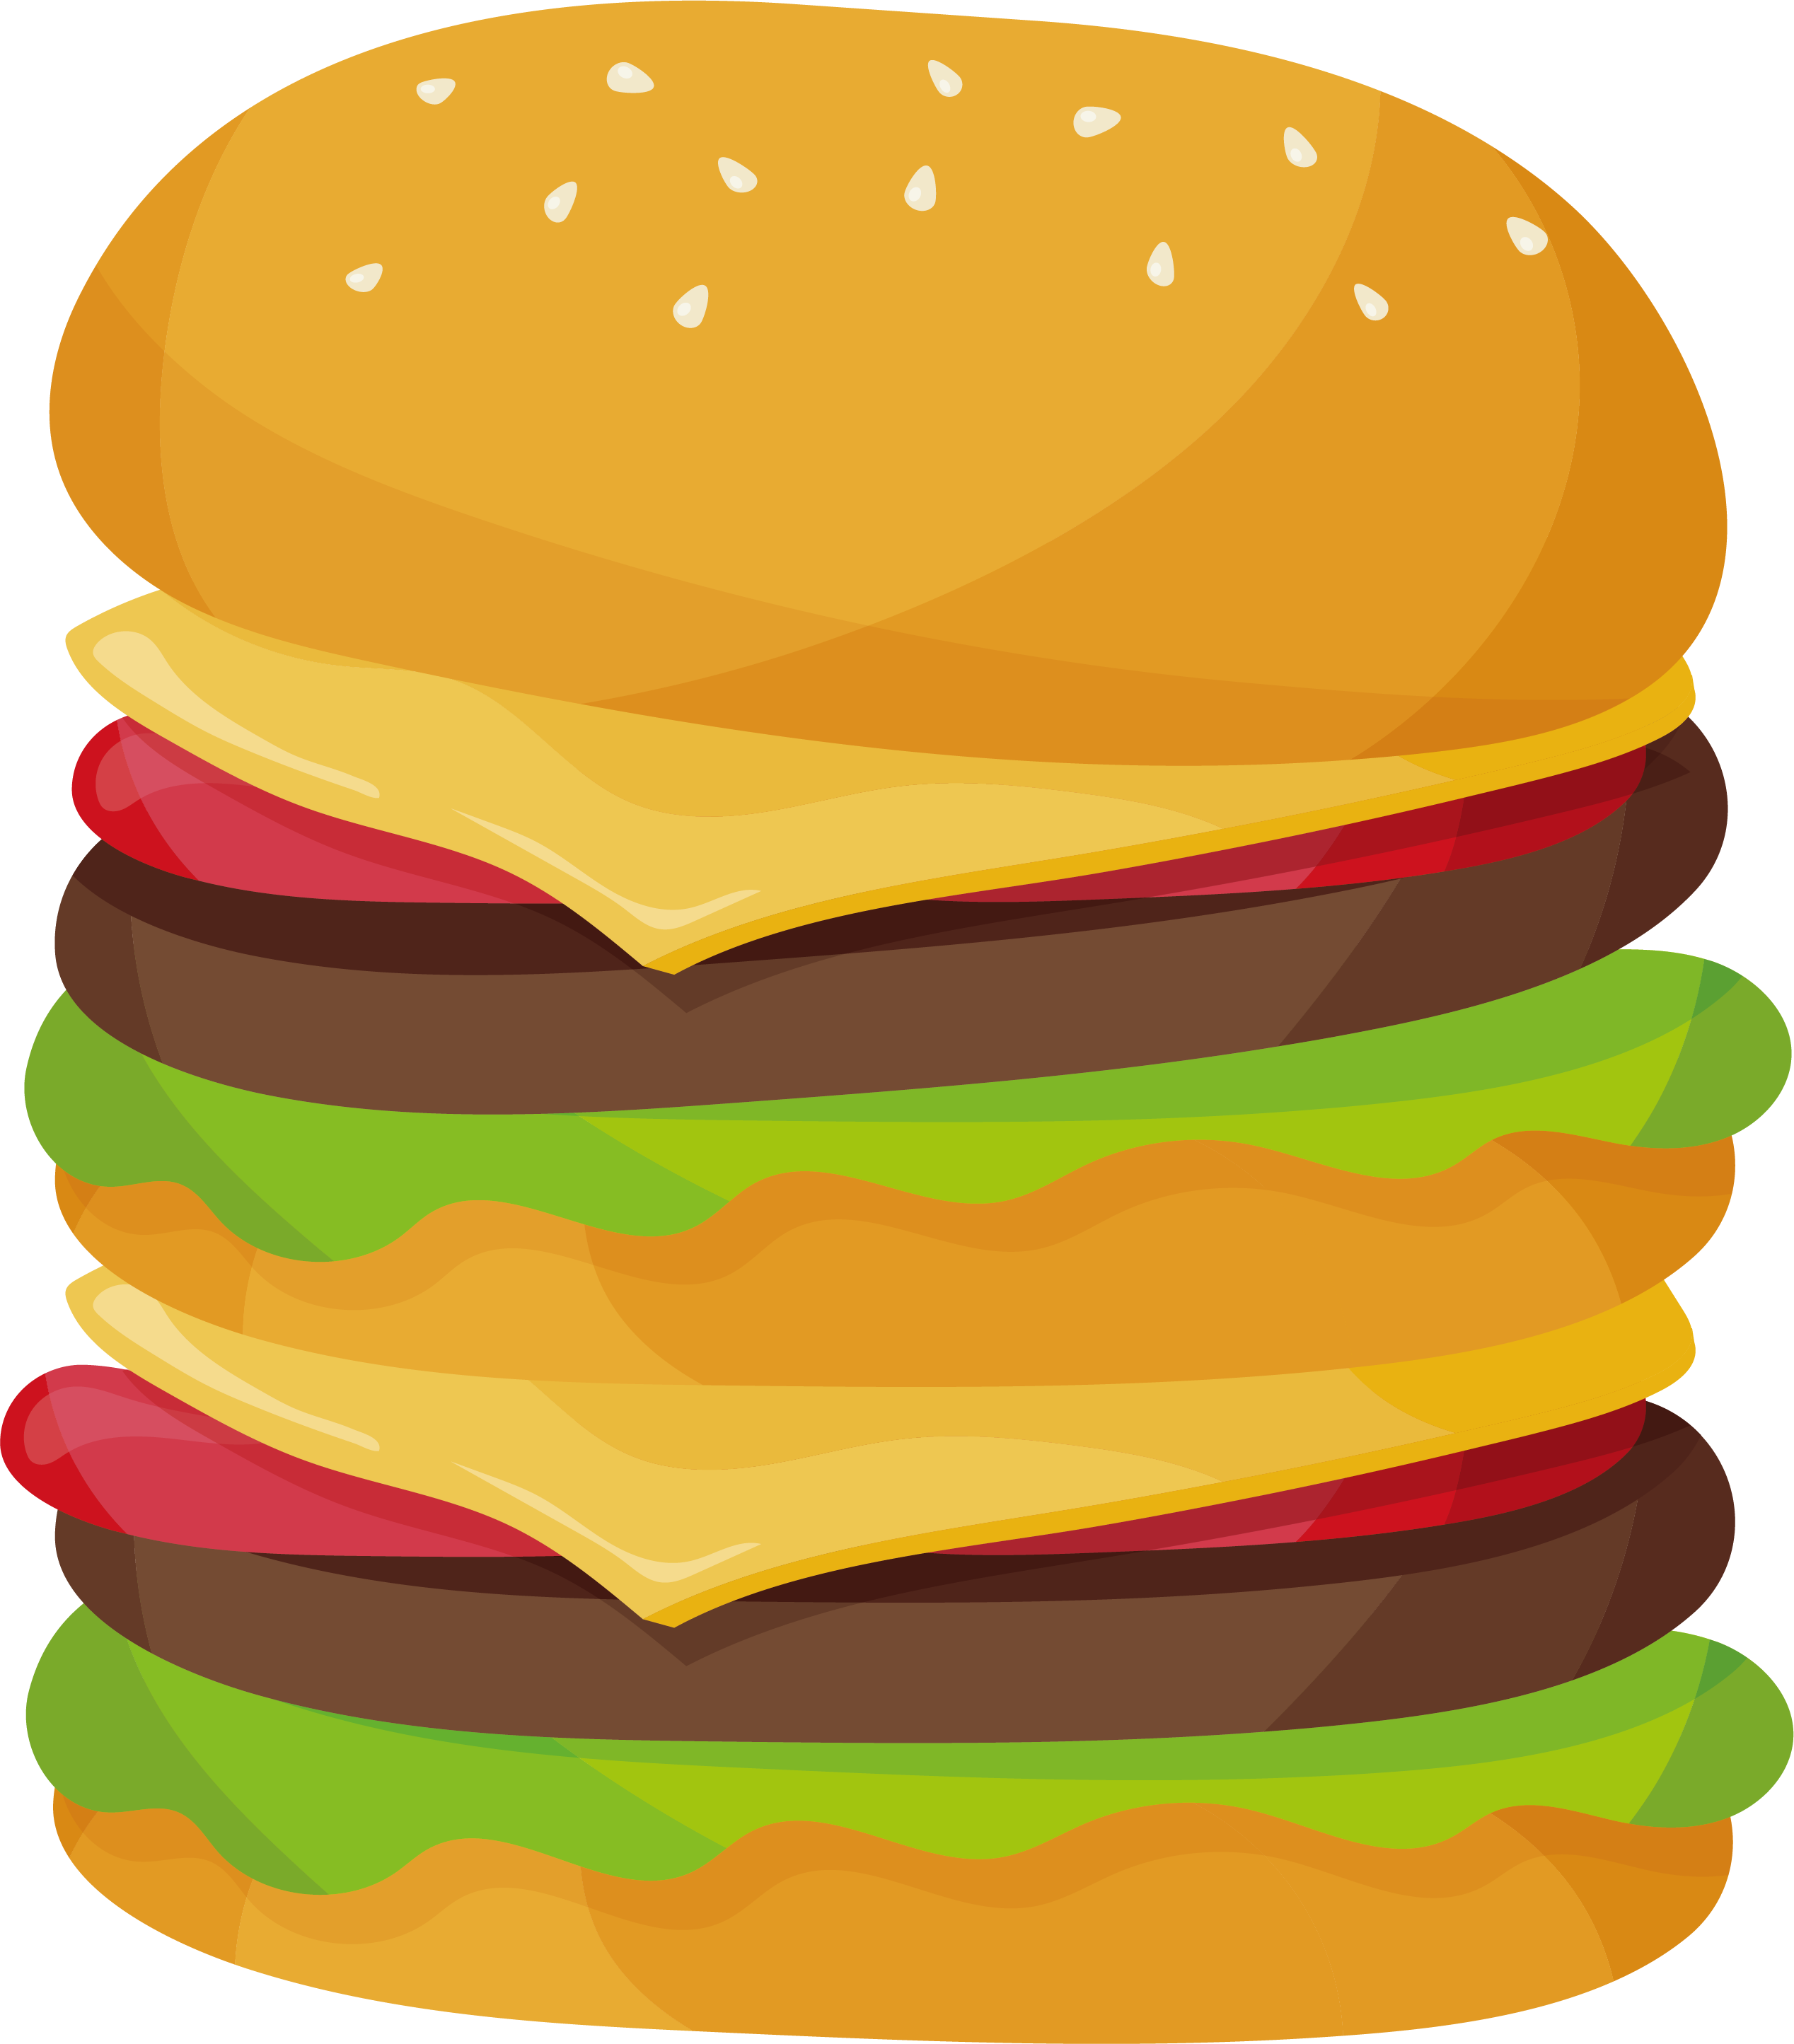 Burger clipart burger mcdonalds. Veggie x free